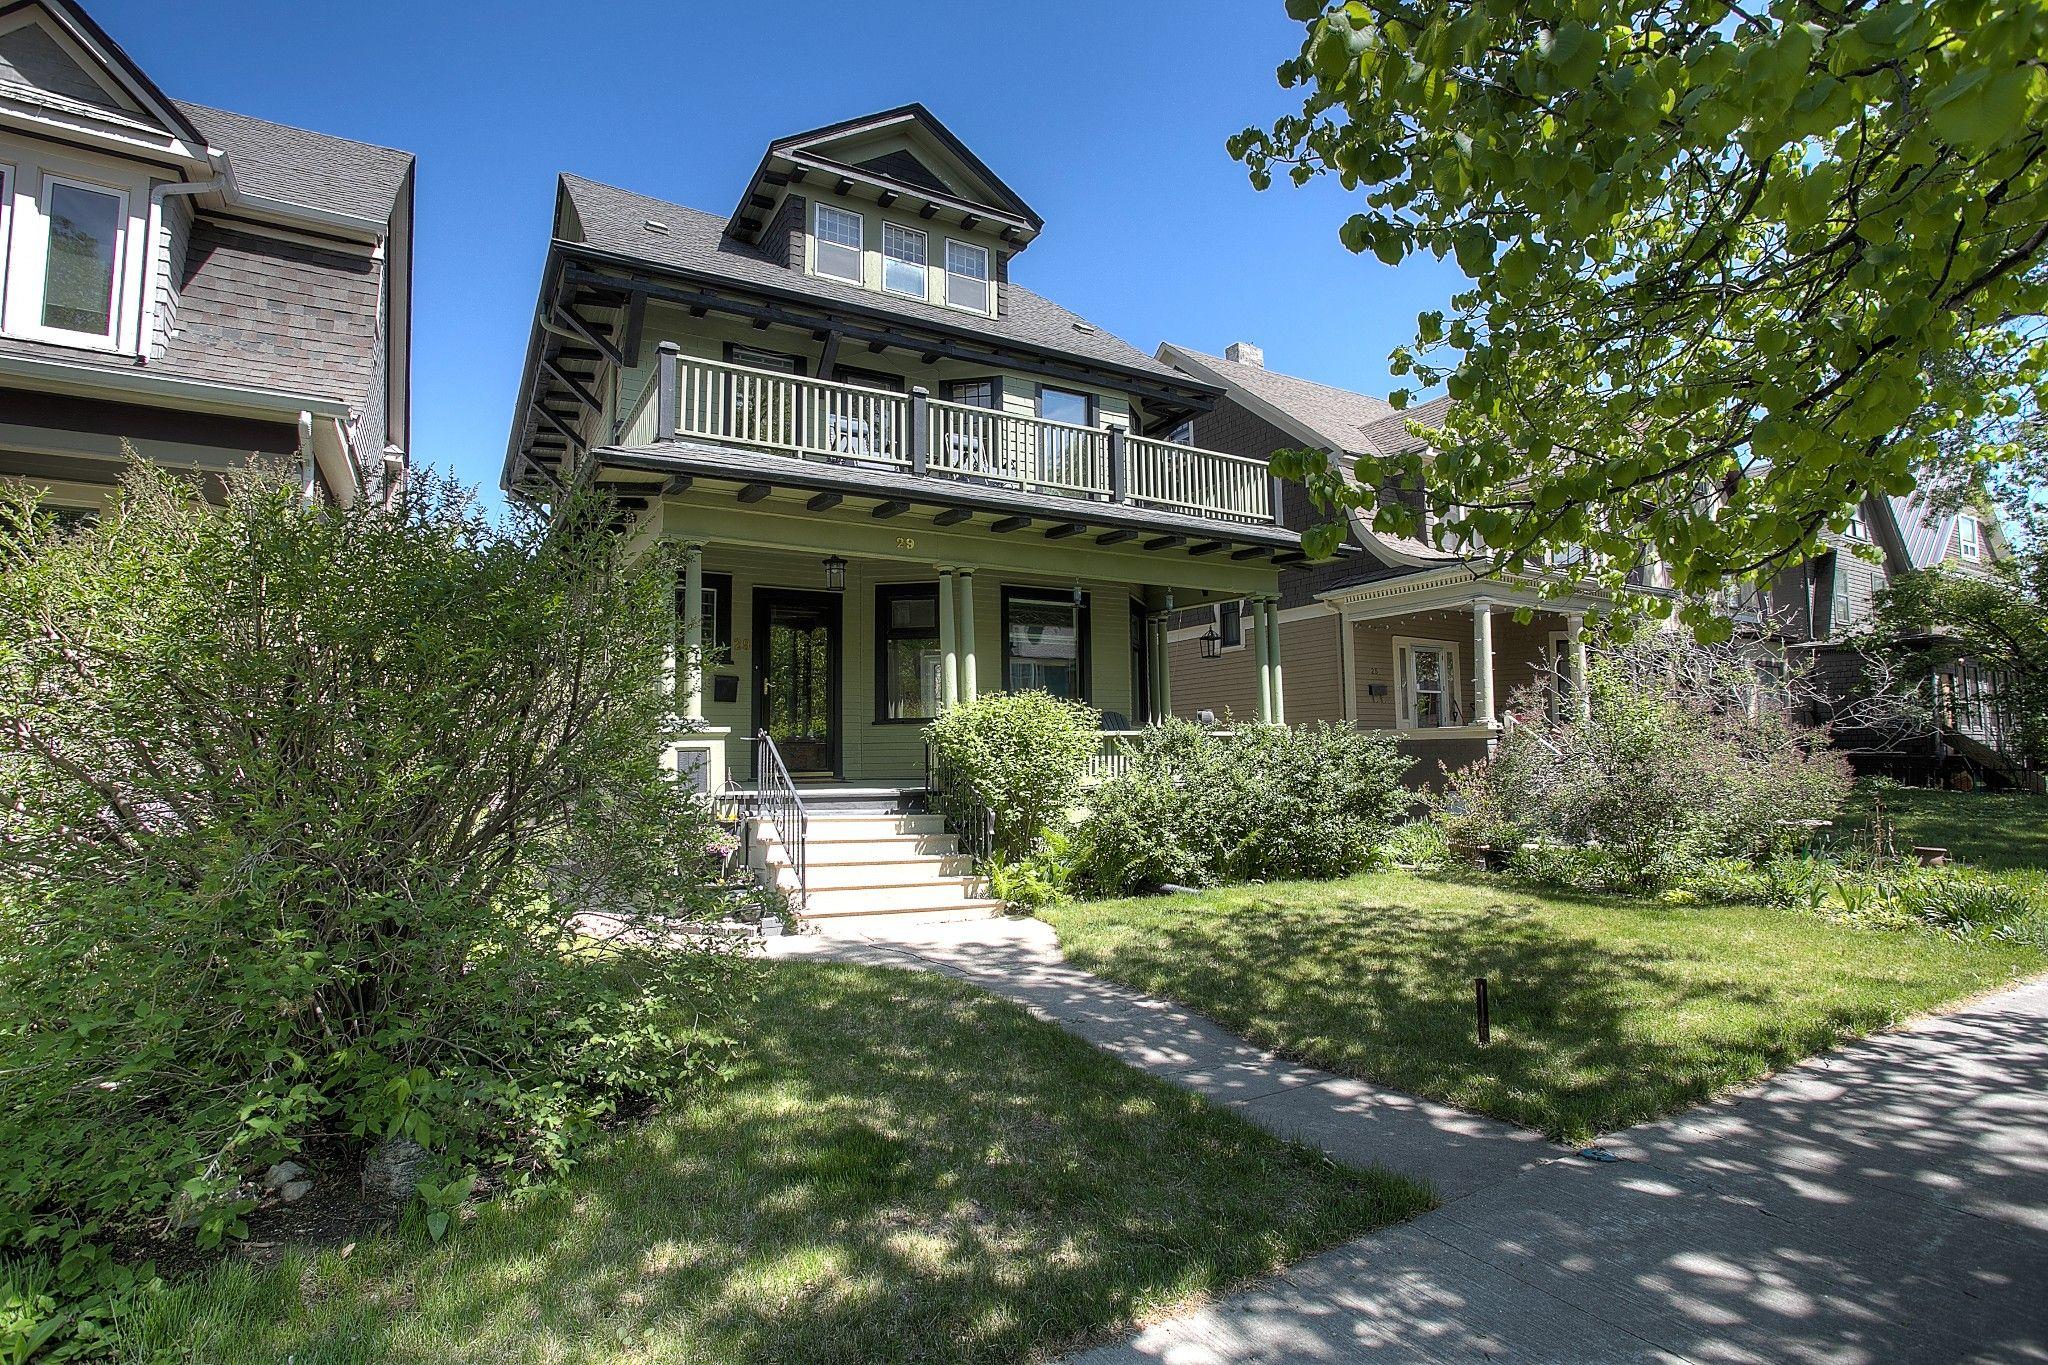 Main Photo: 29 Purcell Avenue in Winnipeg: Wolseley Single Family Detached for sale (5B)  : MLS®# 202113467